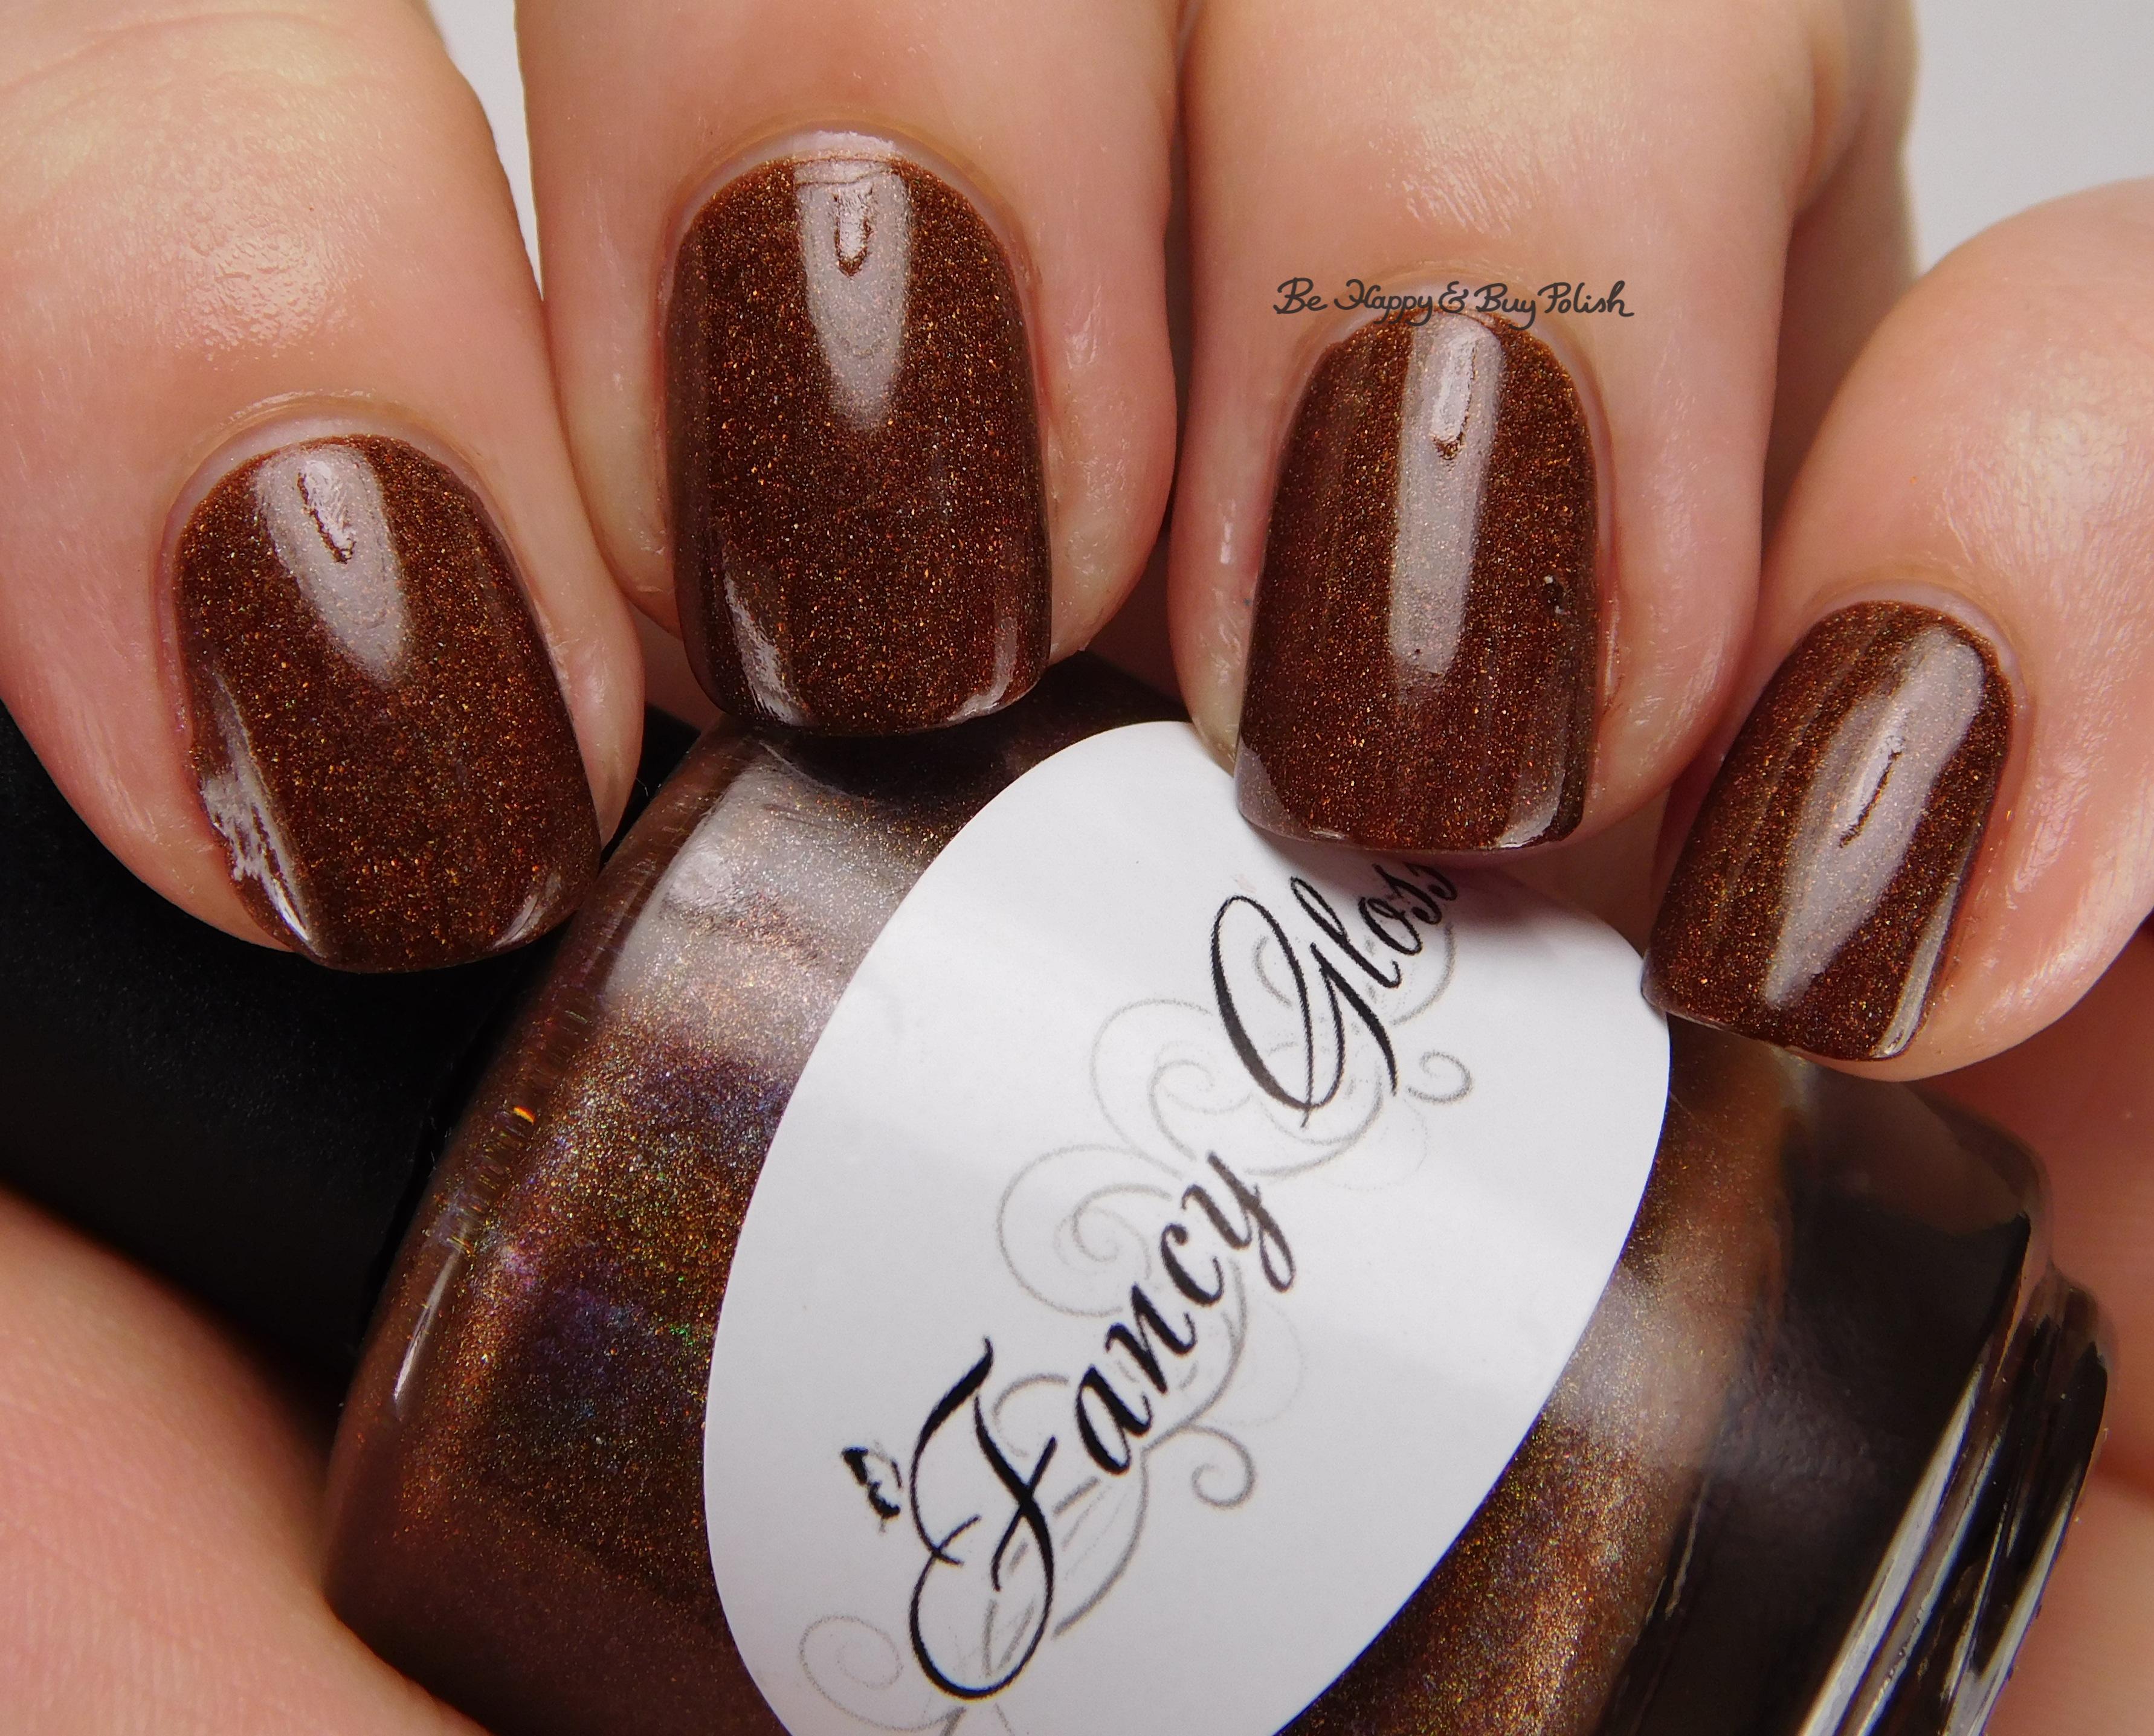 Pick Three Polishes: Fancy Gloss Dark Chocolate (holo), Emily de ...